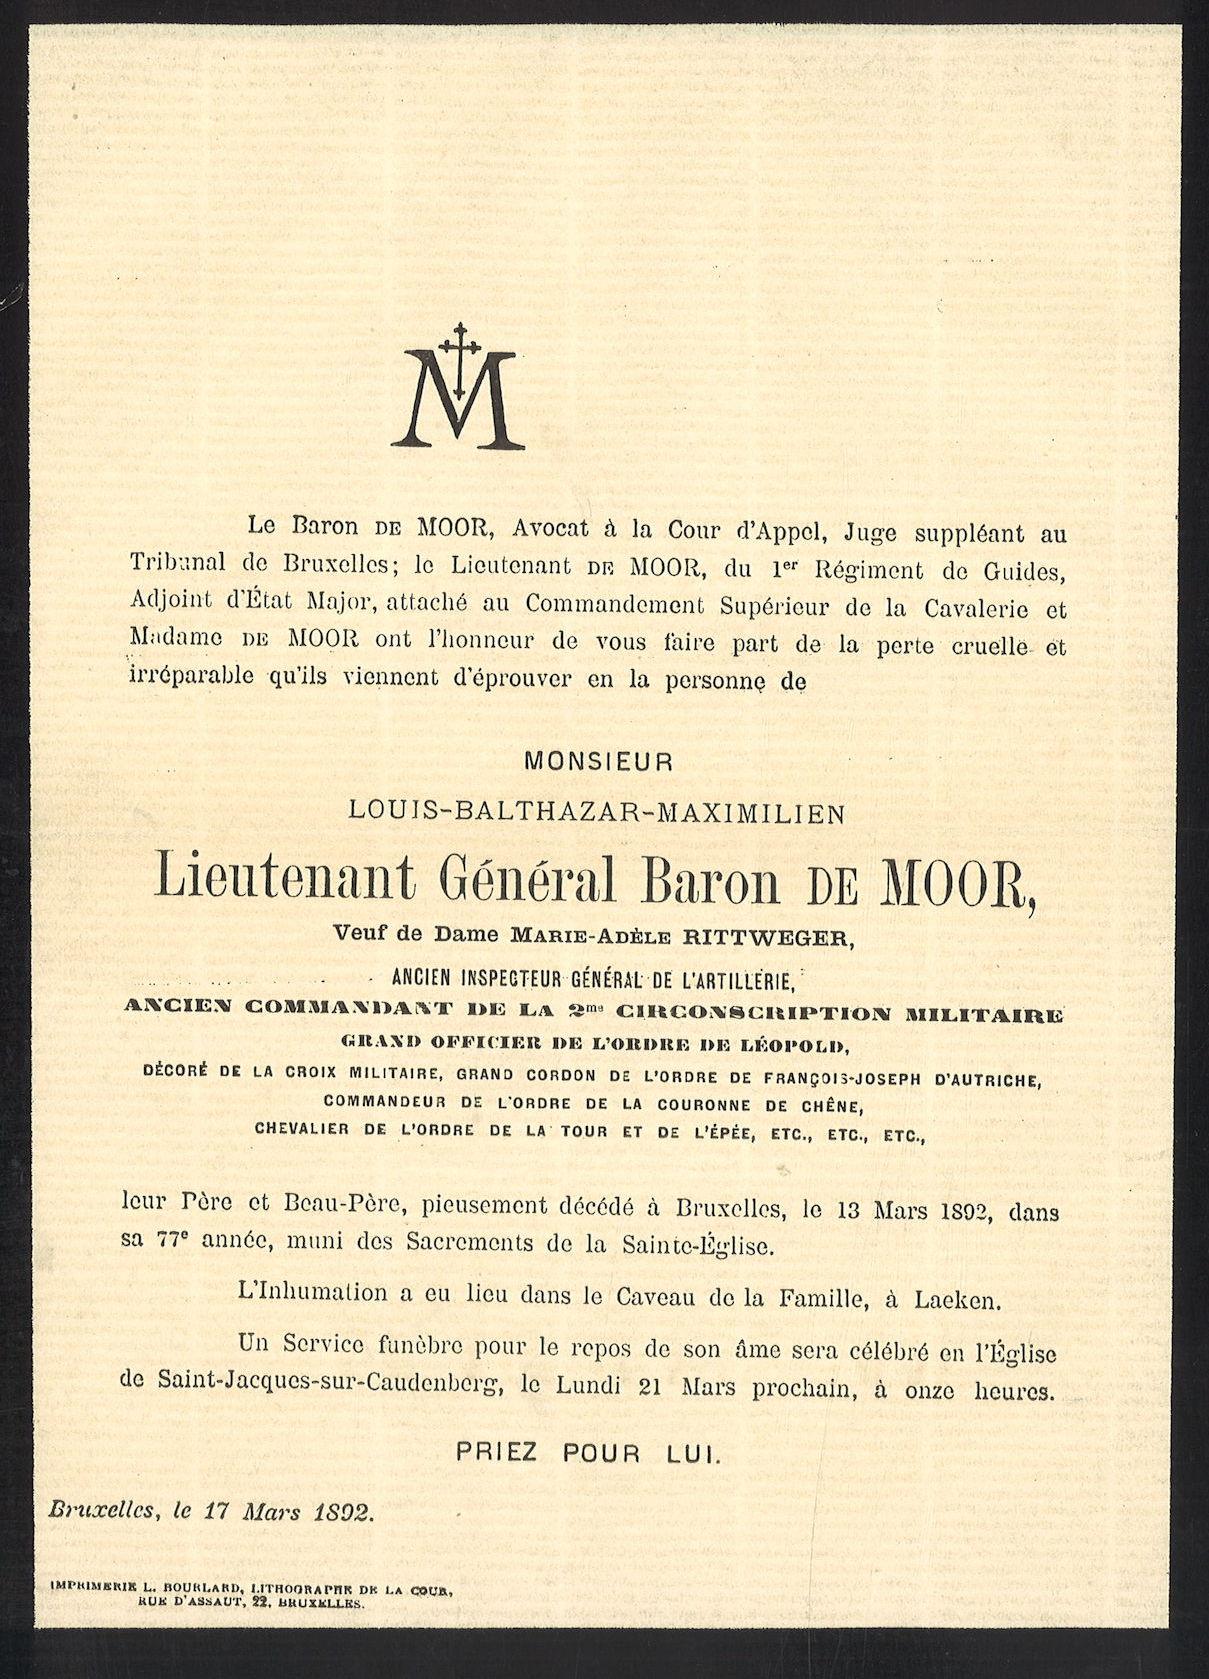 Louis-Balthazar-Maximilien de Moor